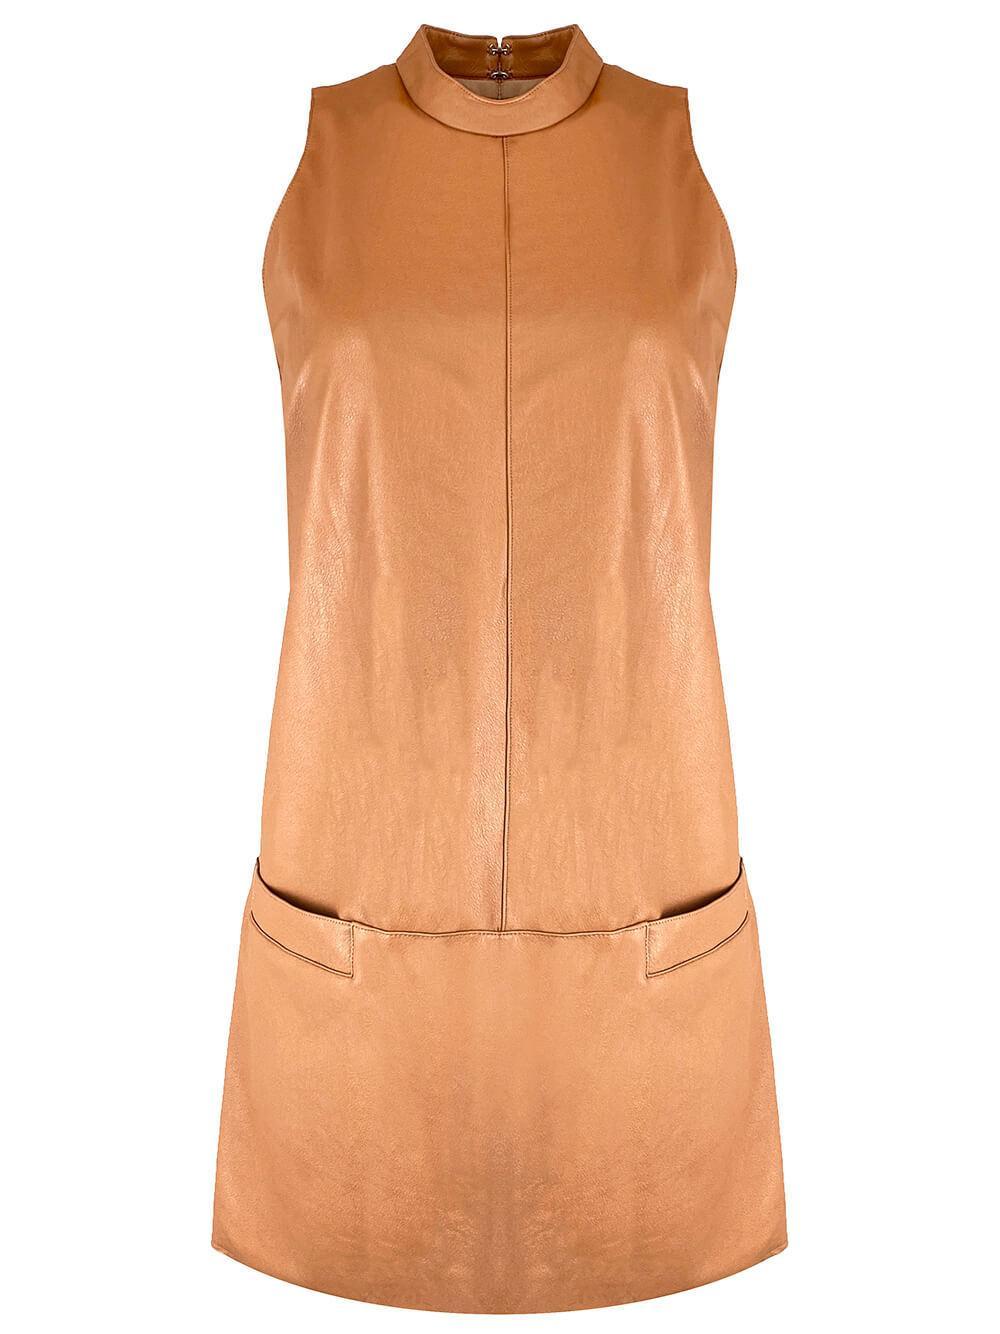 Mayer Faux Leather Dress Item # SL-20949